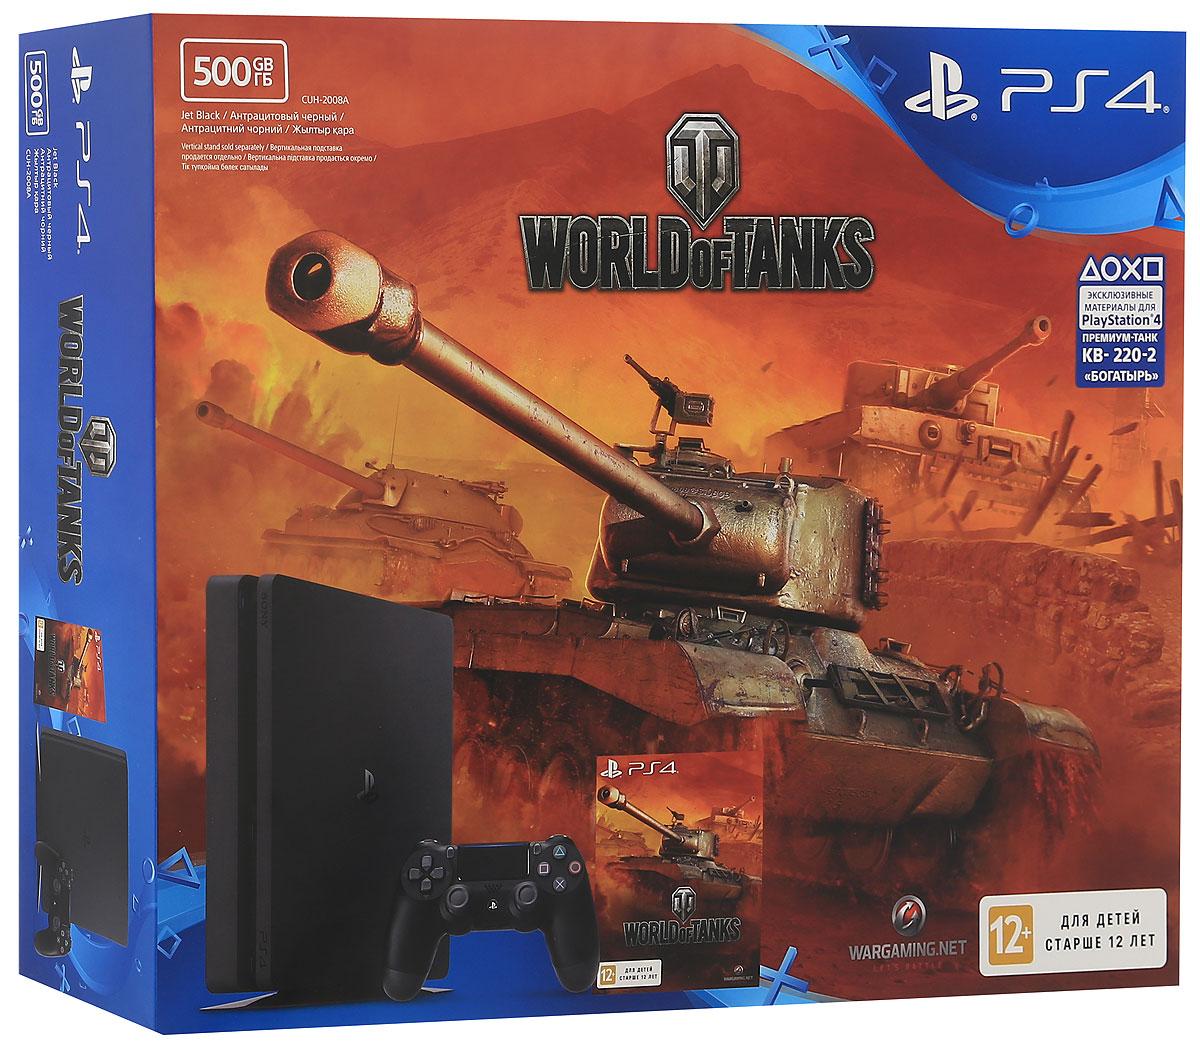 Игровая приставка Sony PlayStation 4 Slim (500 GB) + ваучер World of Tanks